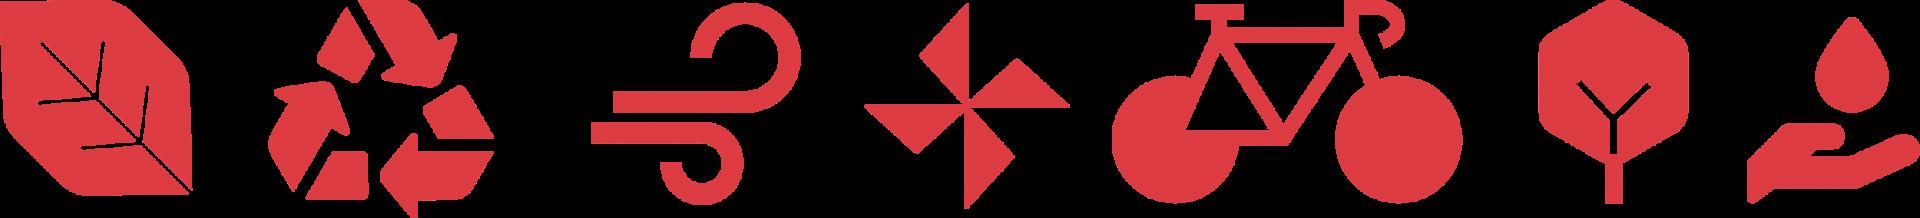 ICONS_nachhaltigkeit-1920×218-1